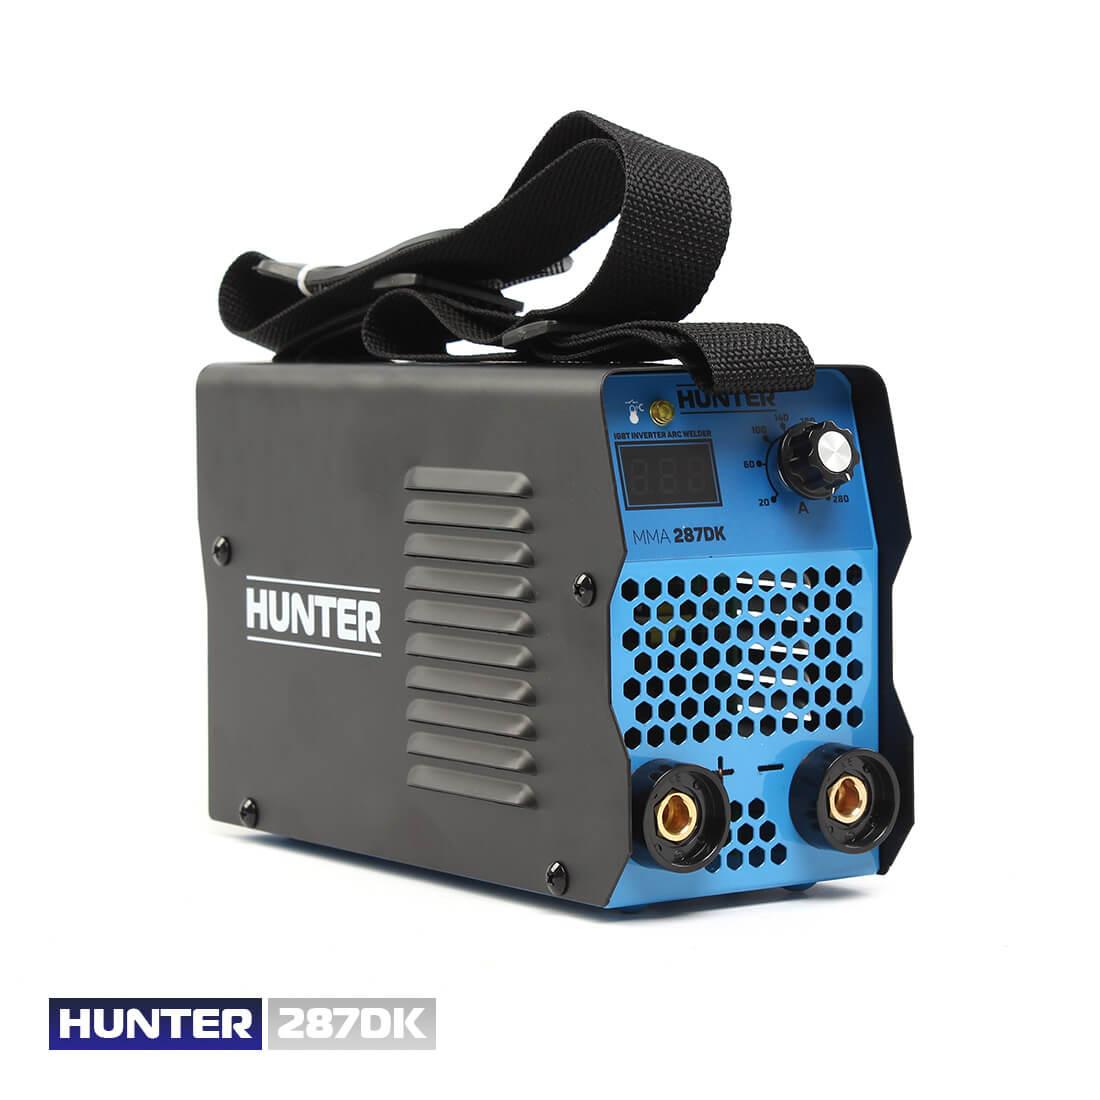 Фото Hunter MMA 287DK (дуговая) цена 2550грн №1 — Hunter